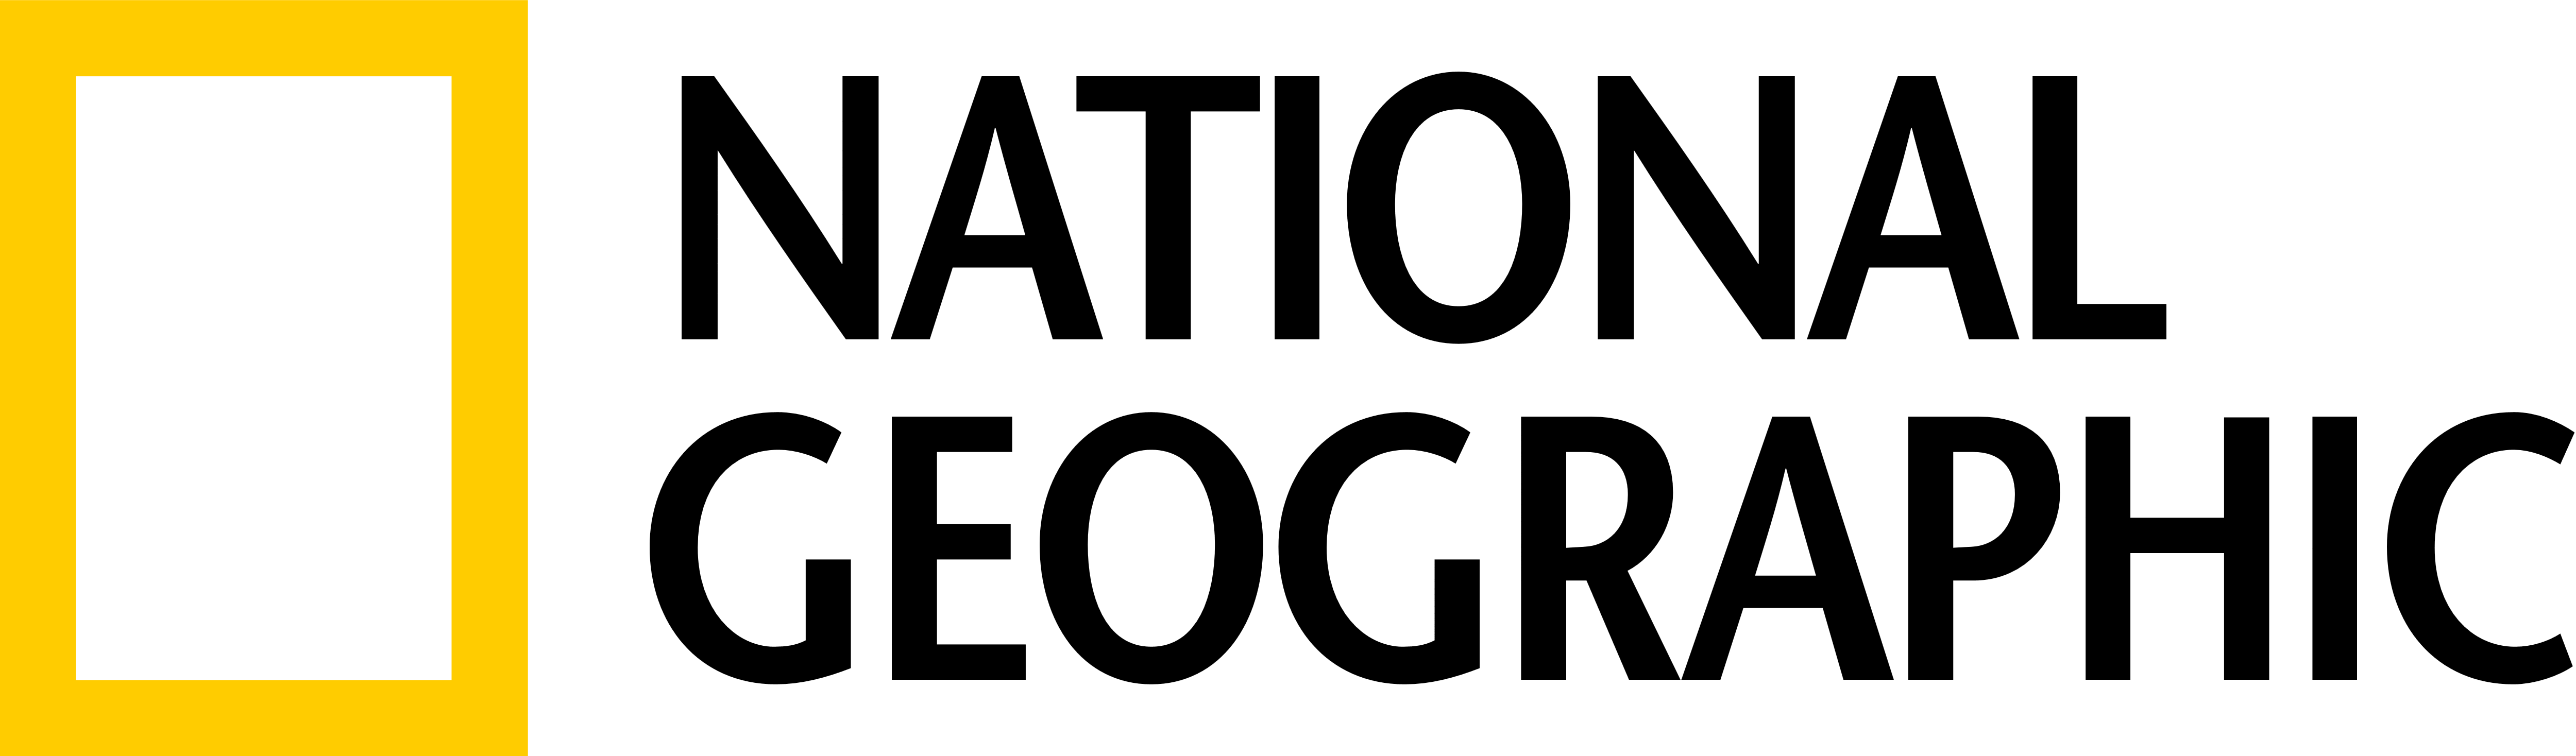 「national geographic logo」的圖片搜尋結果